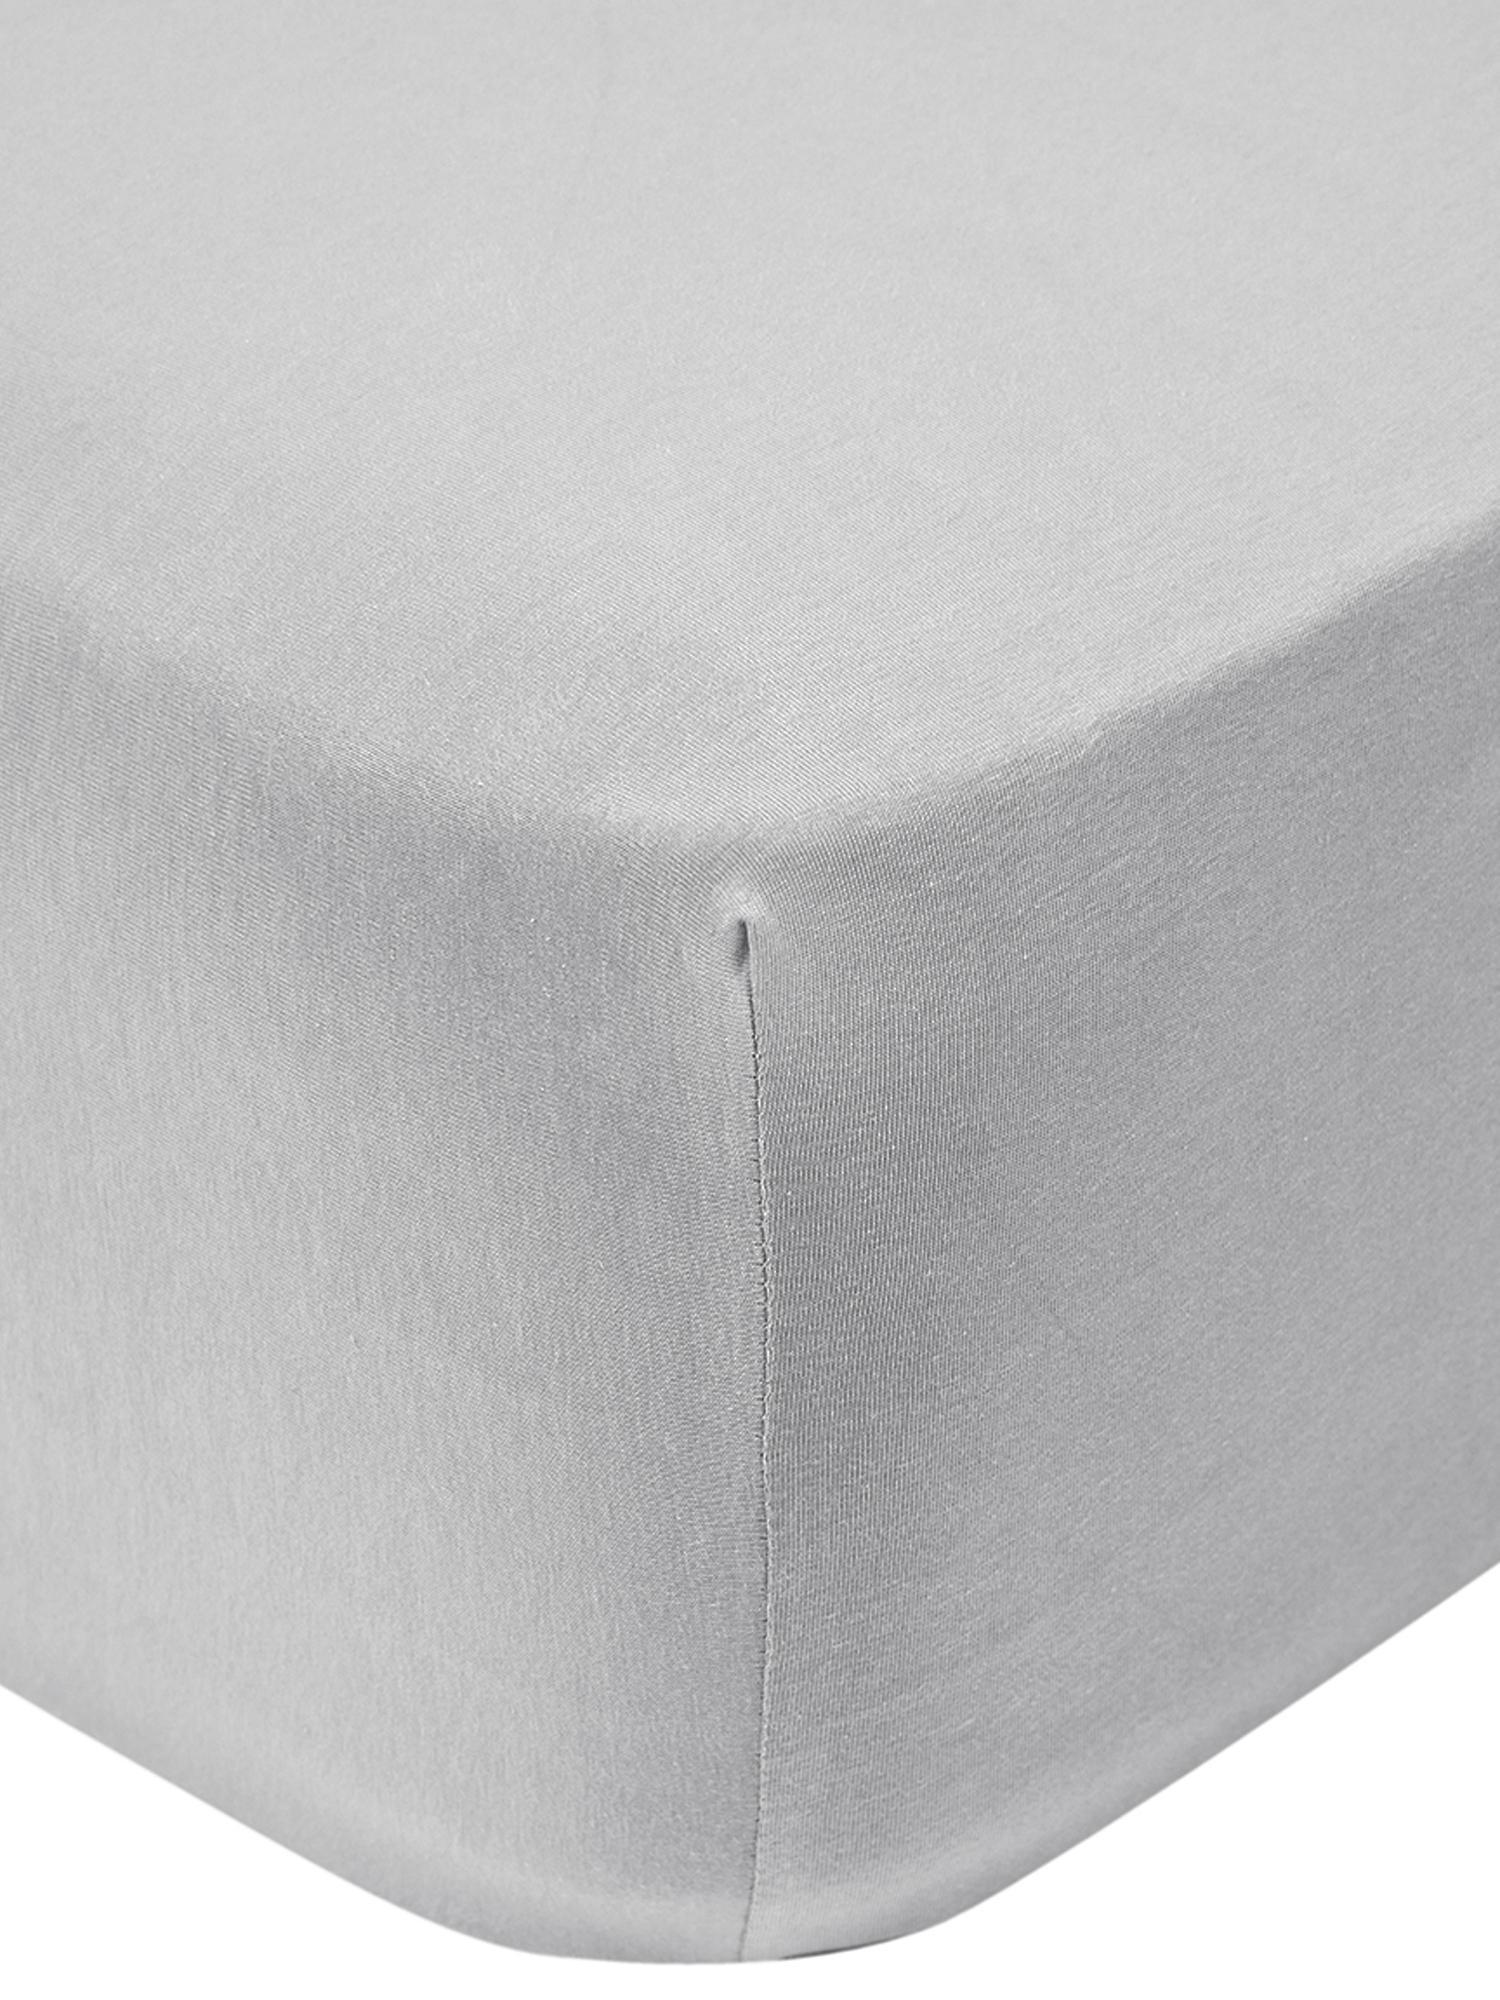 Topper-Spannbettlaken Lara, Jersey-Elasthan, 95% Baumwolle, 5% Elasthan, Hellgrau, 180 x 200 cm